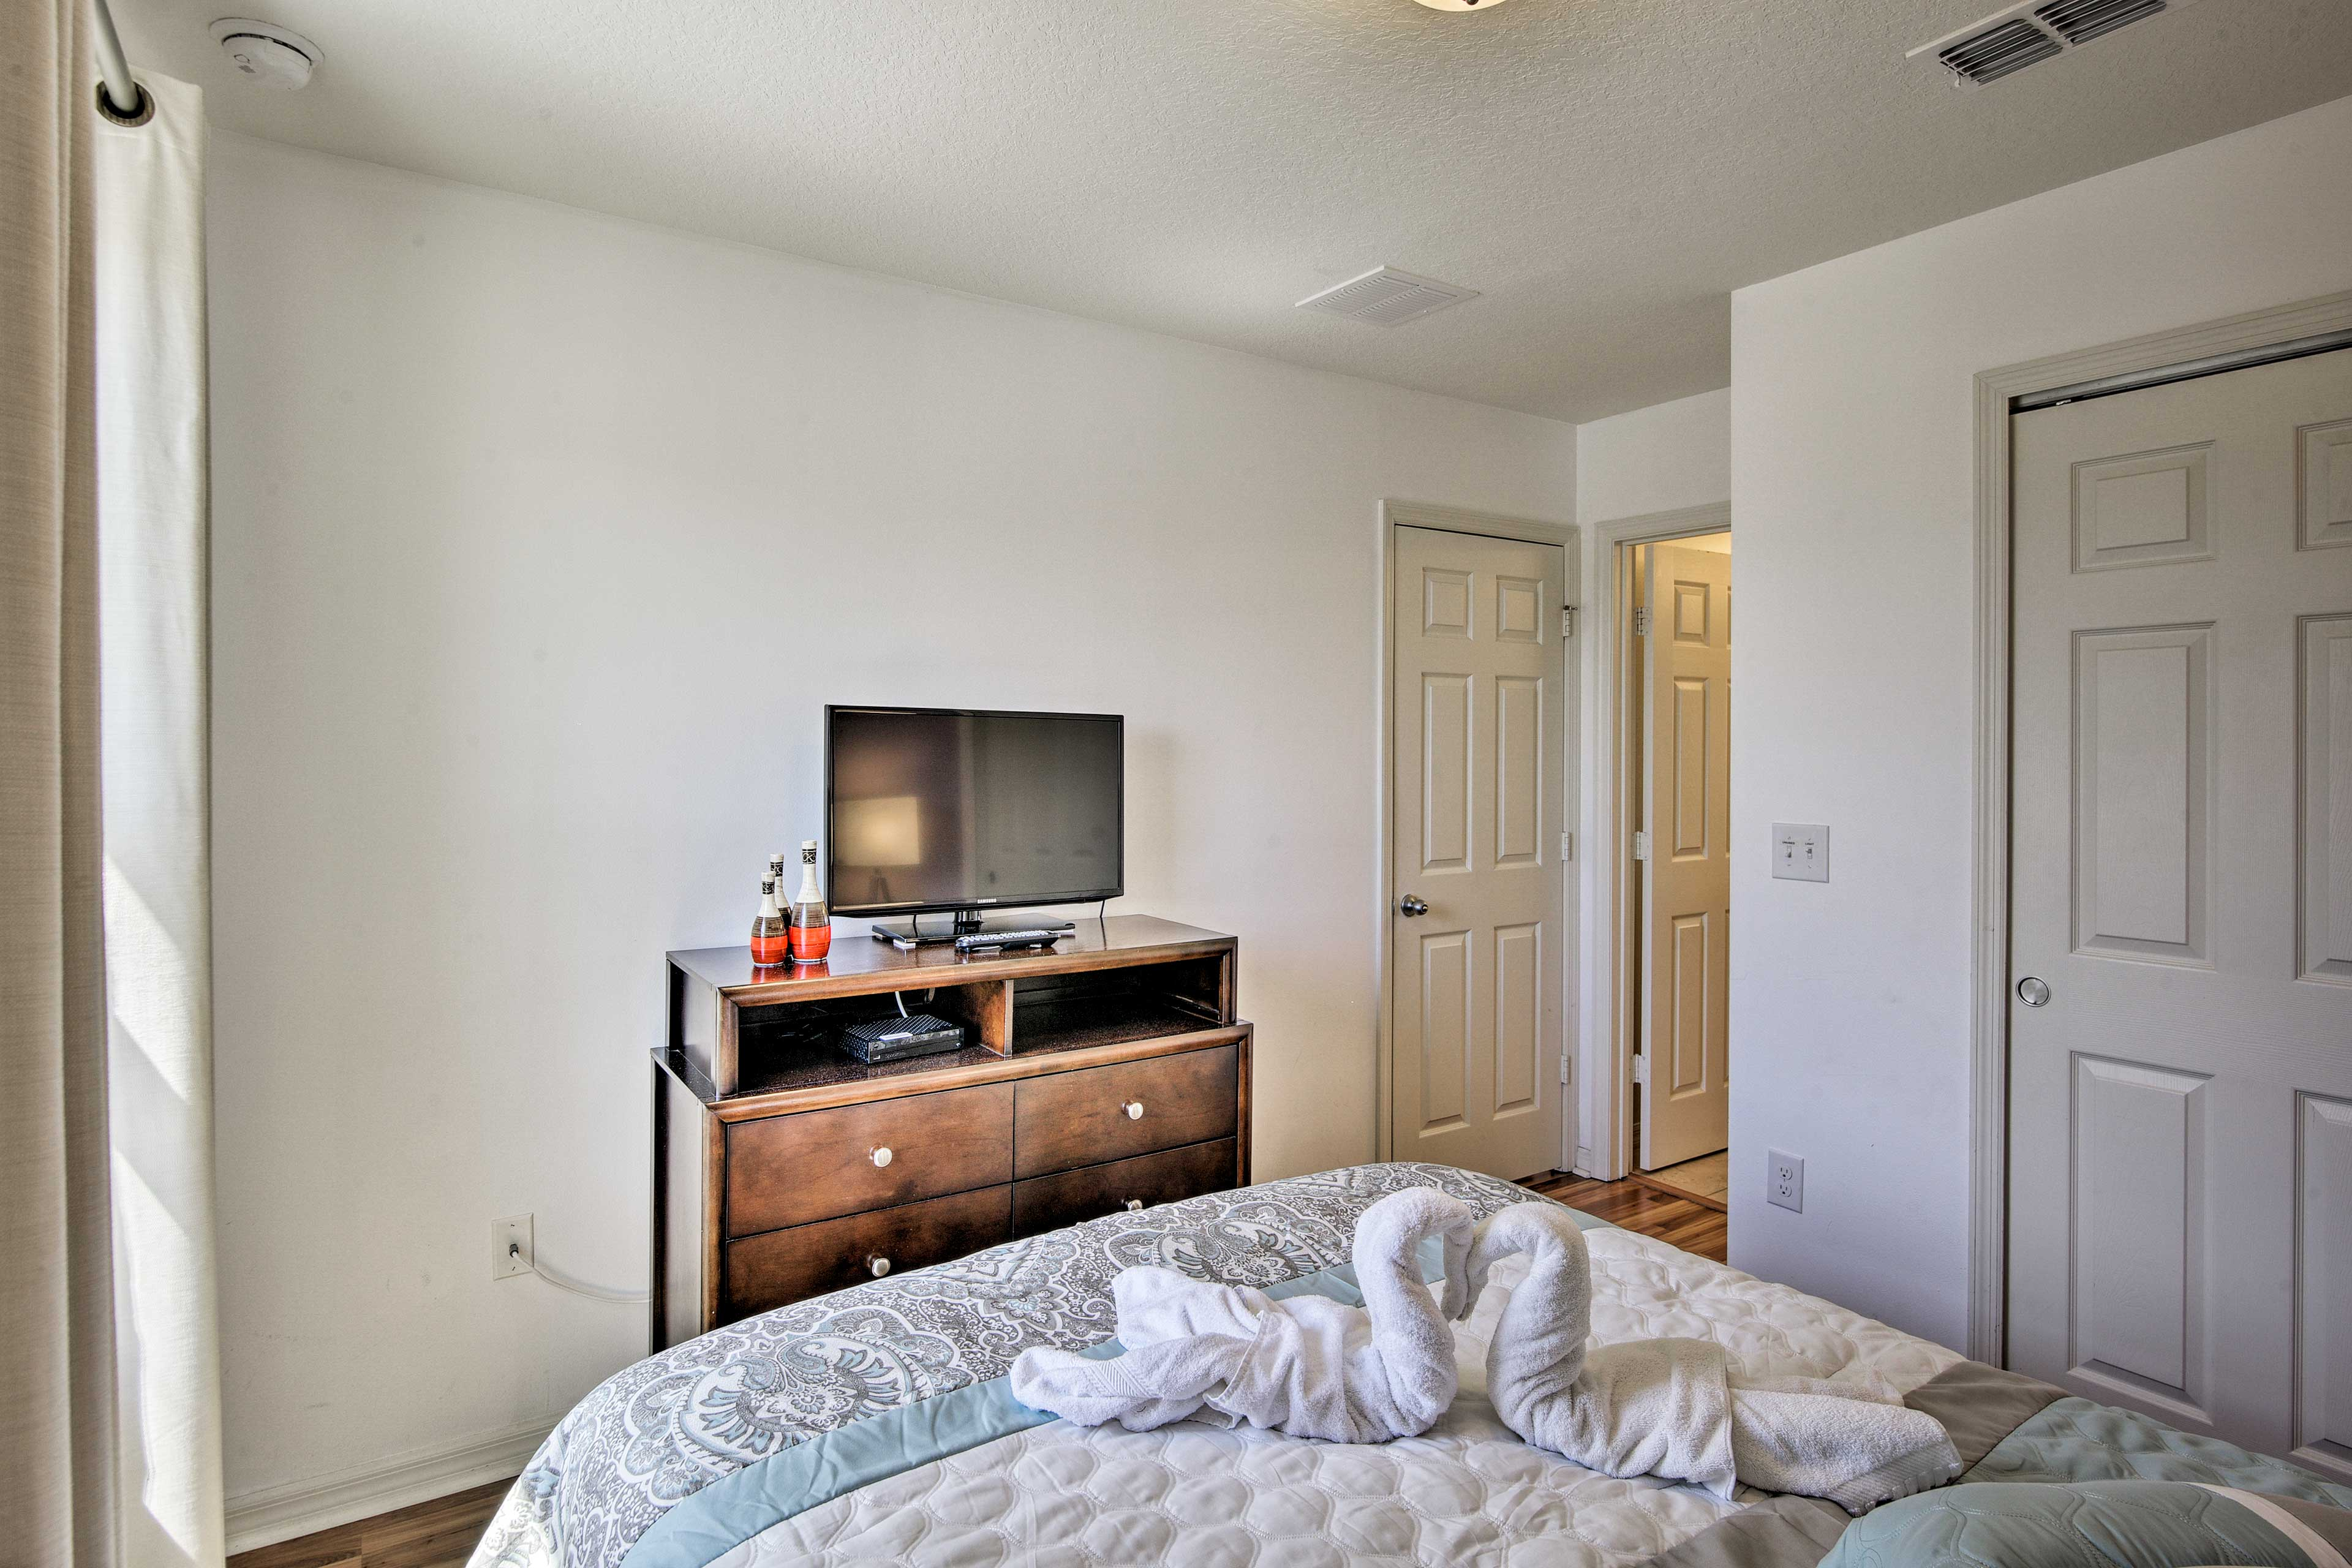 Each room has a flat-screen TV!